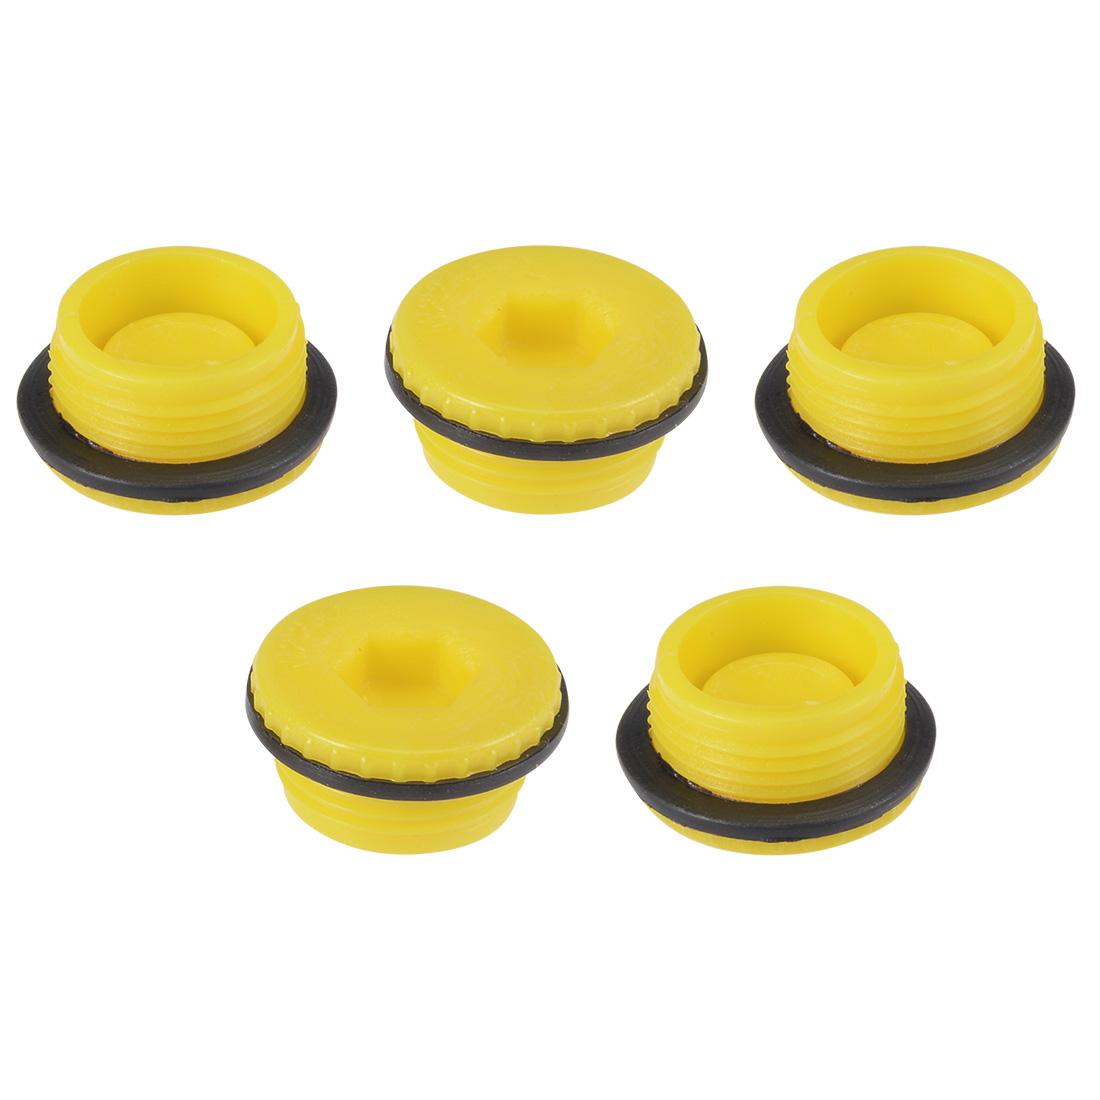 MLD-M22 M22 Hex Socket Design PE Plastic Male Threaded Sealing Cap Yellow 5pcs